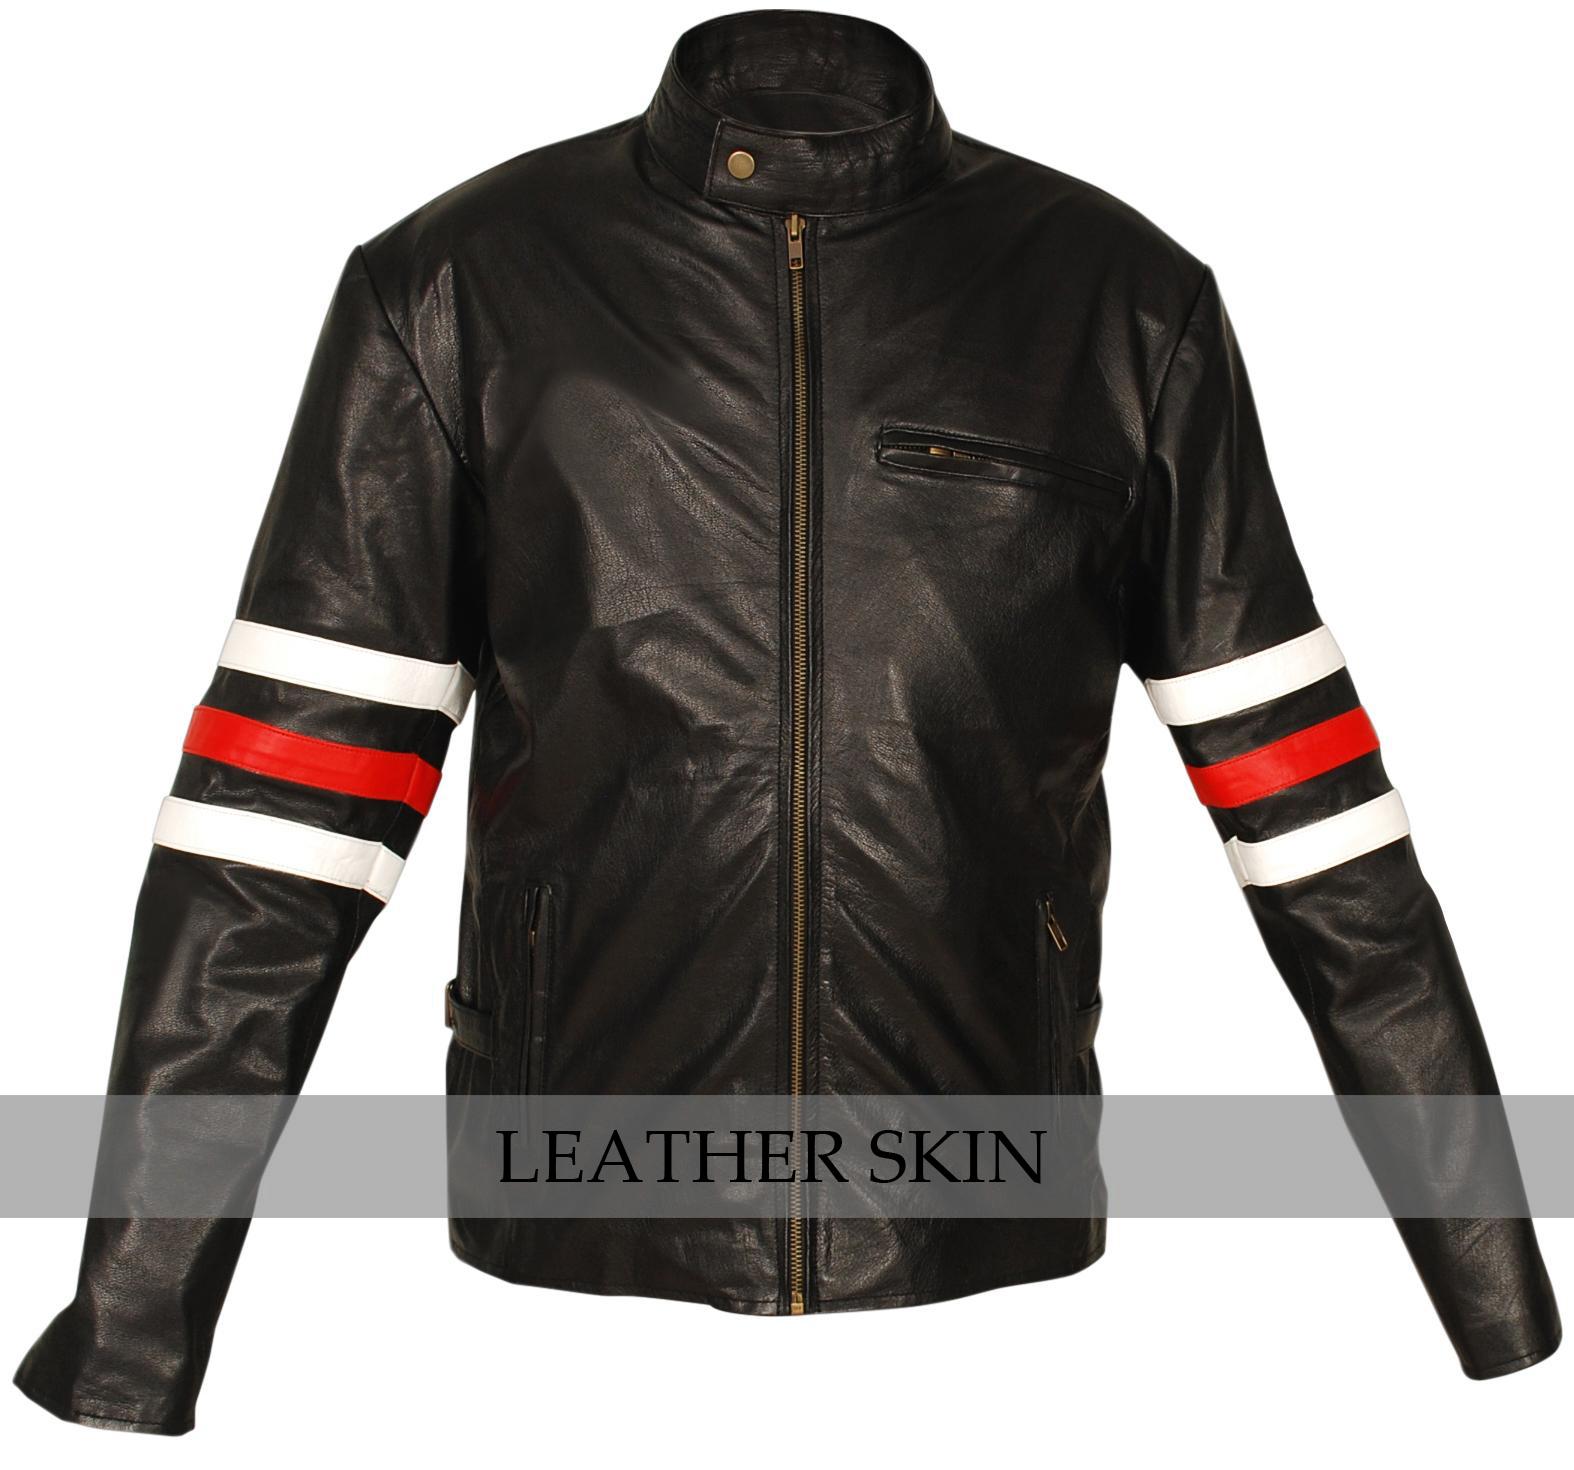 Stylish Premium Black Leather Jacket w/ White Red sleeve rings & side pockets